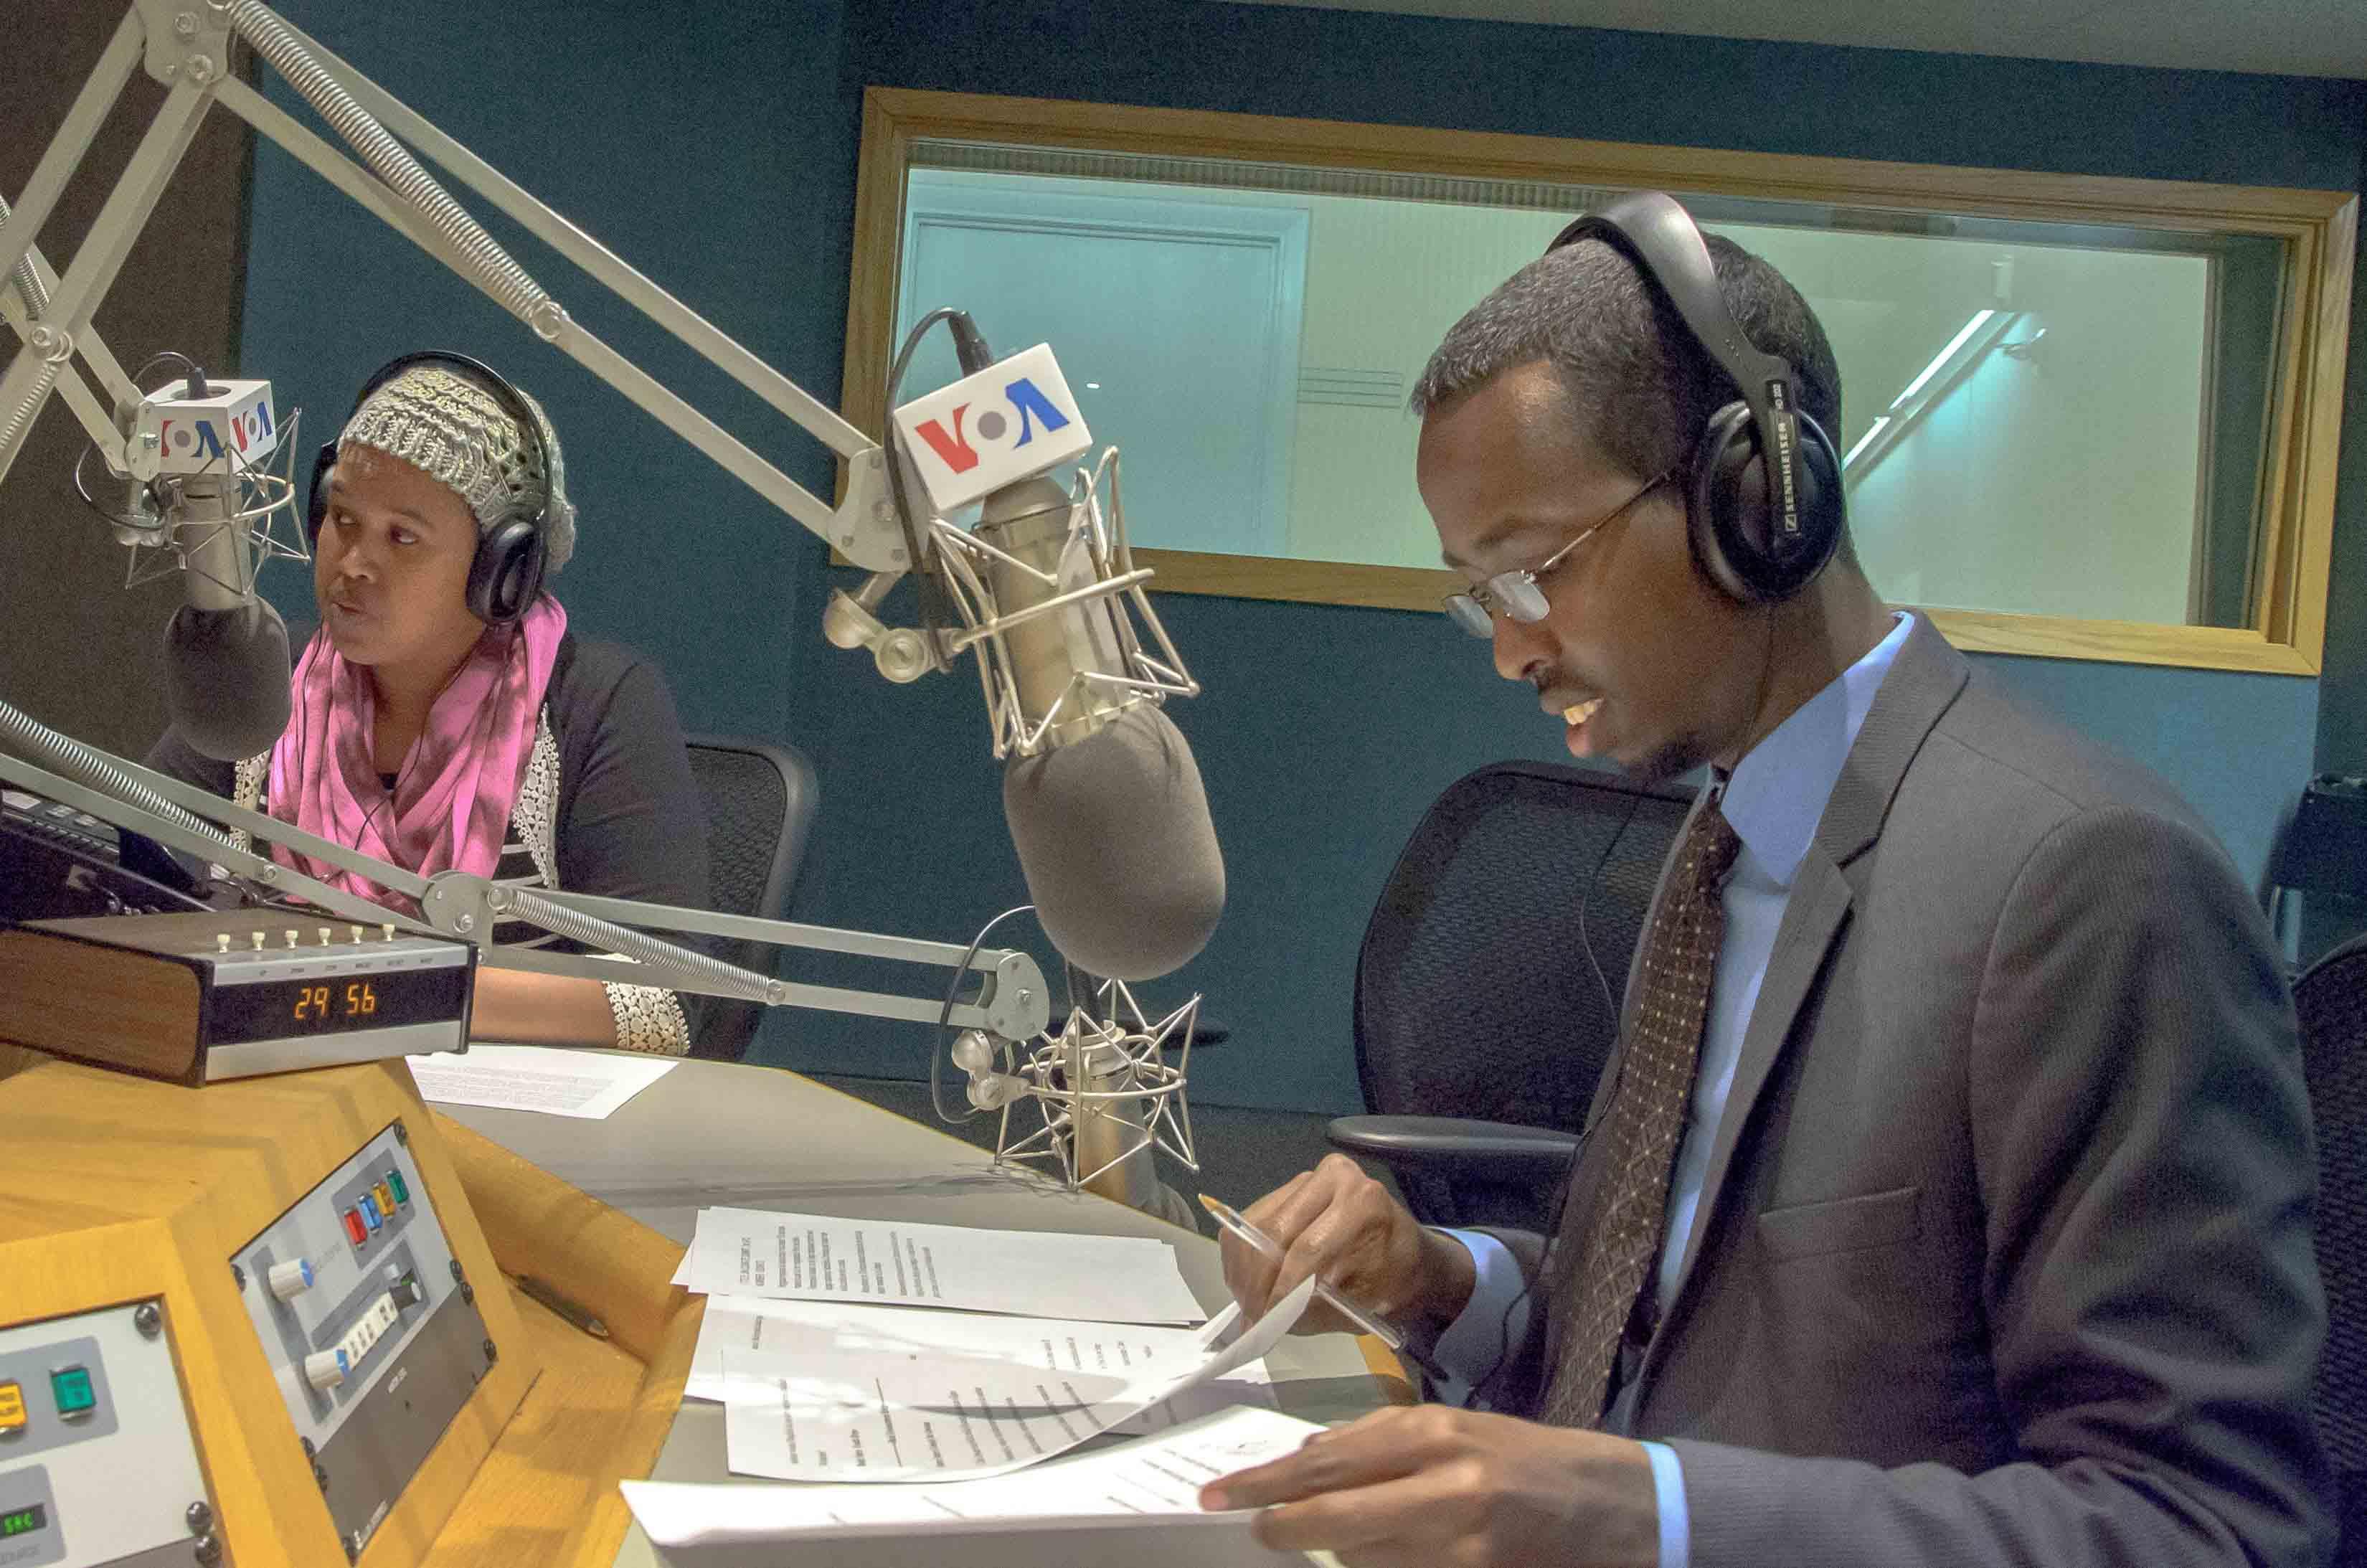 New VOA radio program for Somali youth